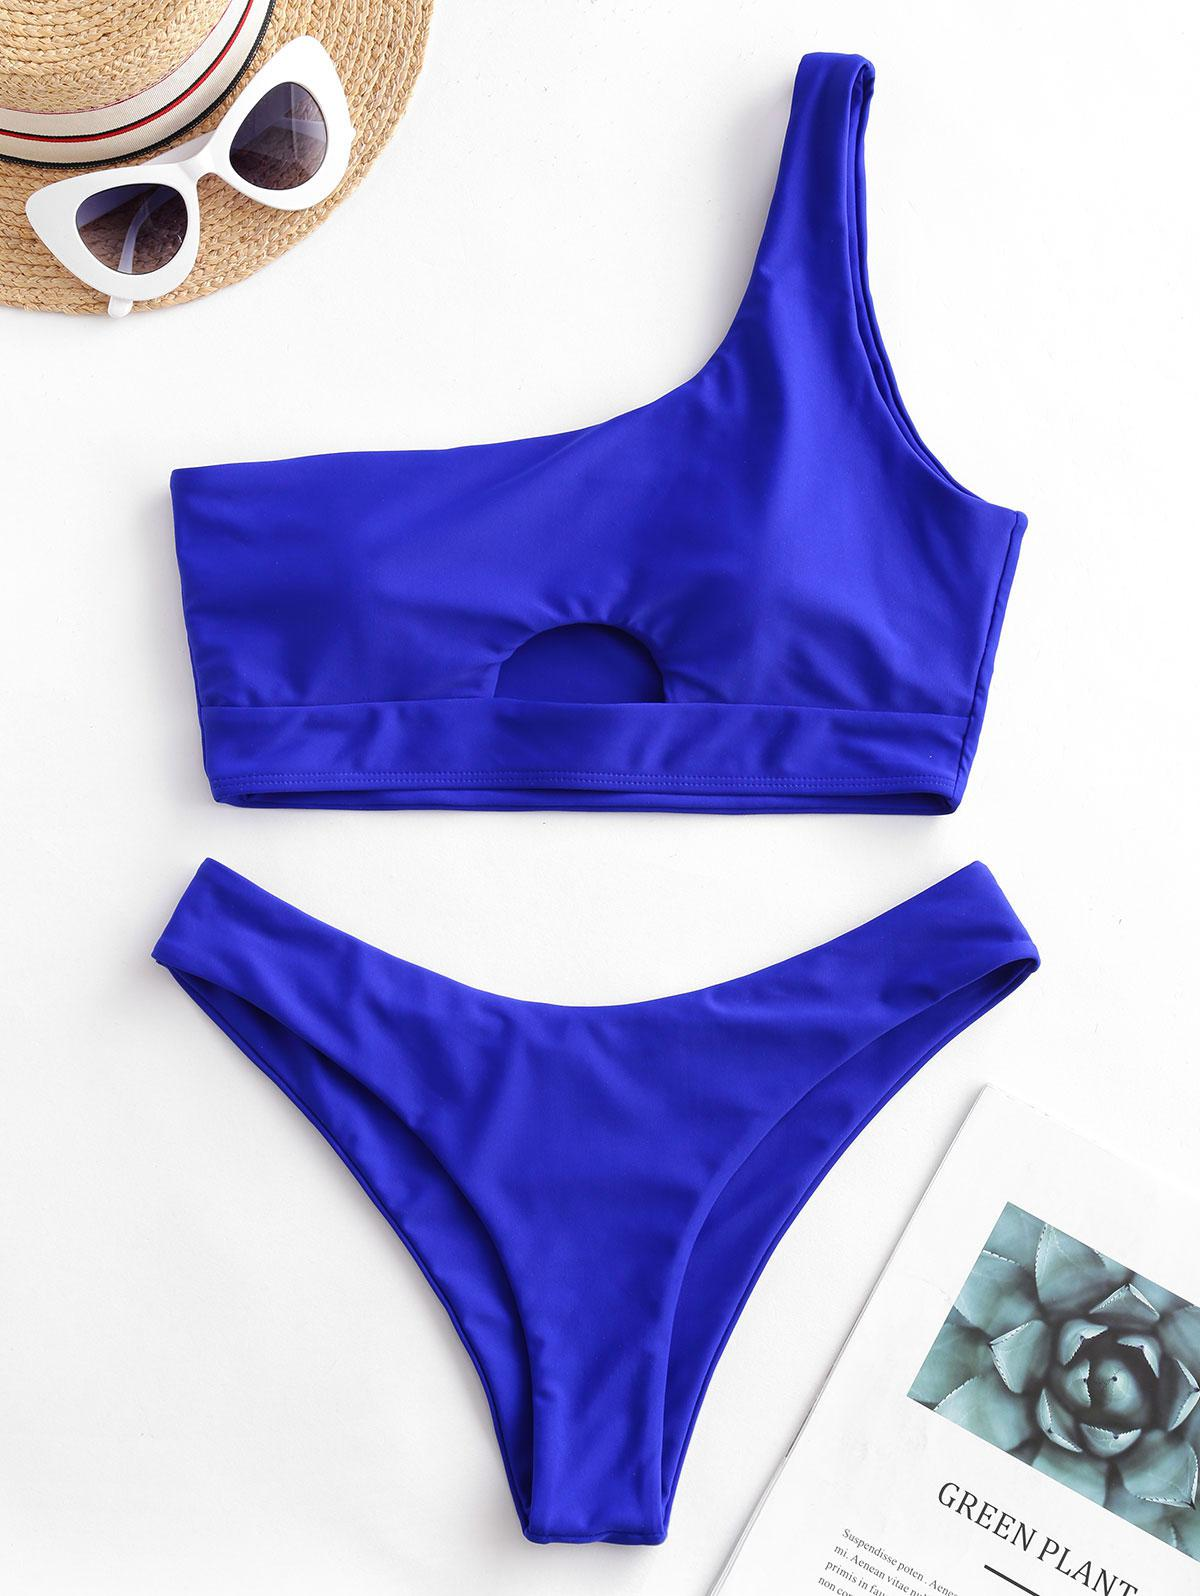 ZAFUL One Shoulder Hollow Out High Leg Bikini Swimsuit, Cobalt blue